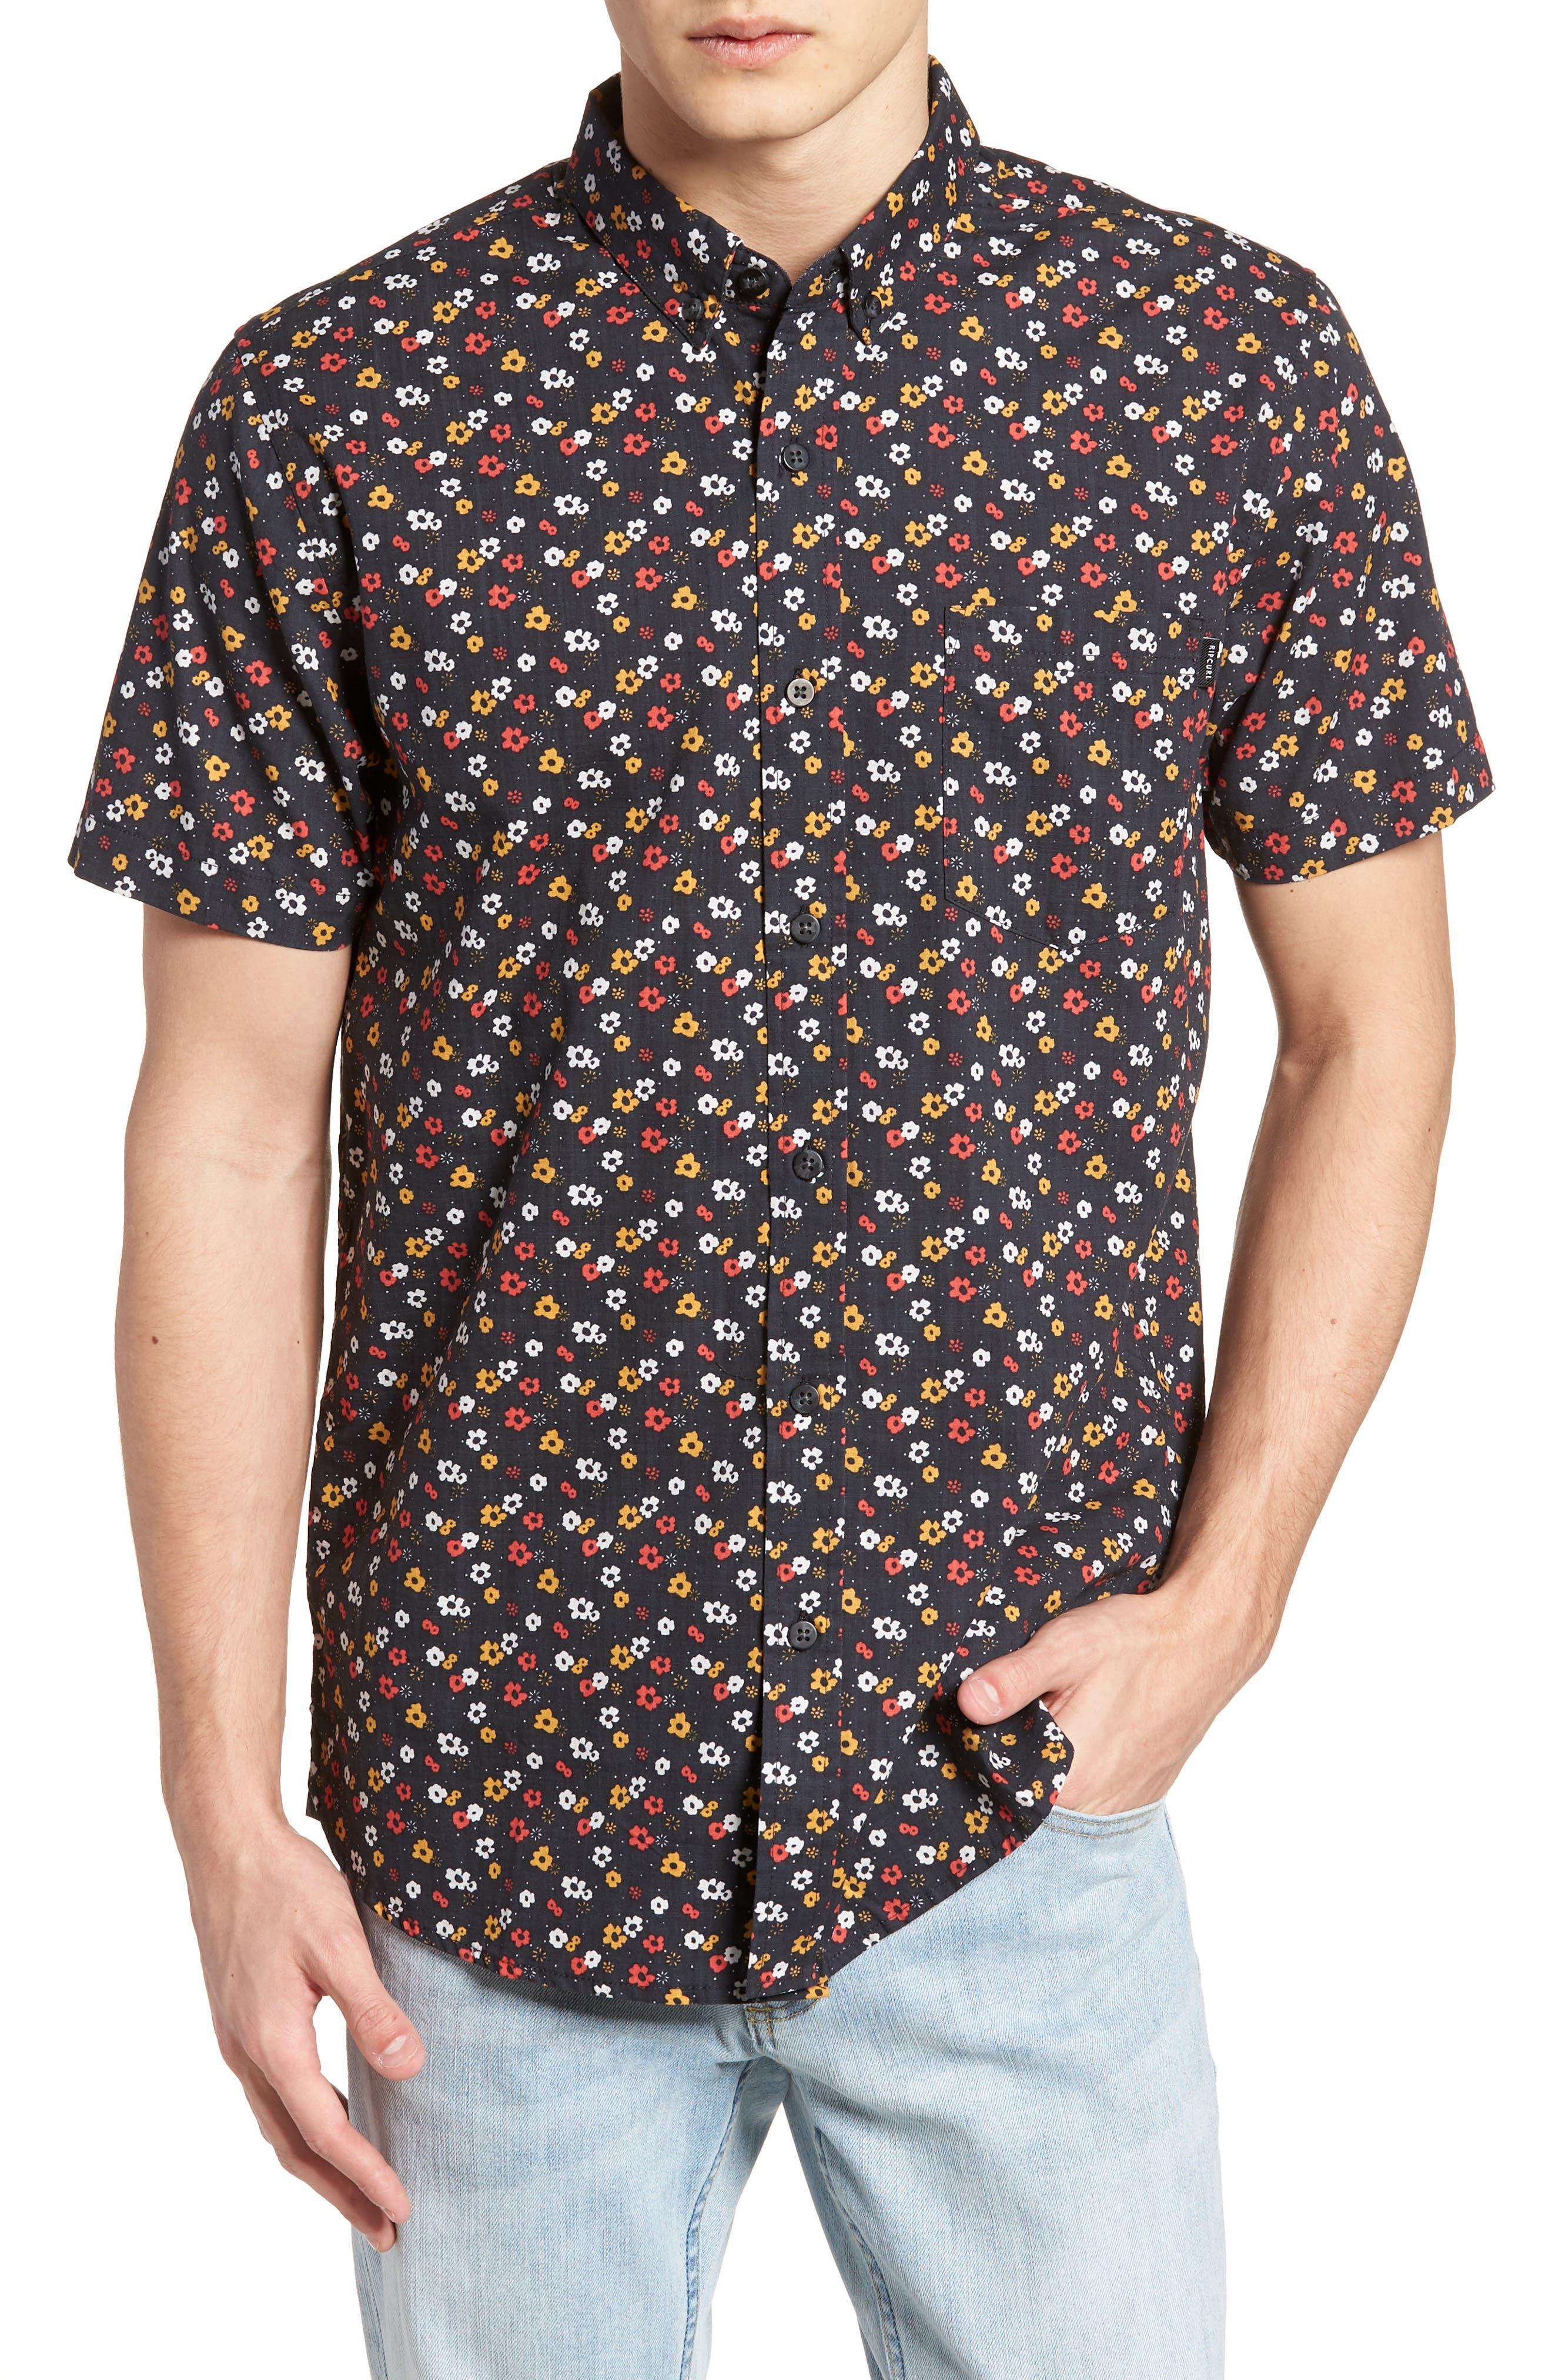 Main Image - Rip Curl Scopic Woven Shirt